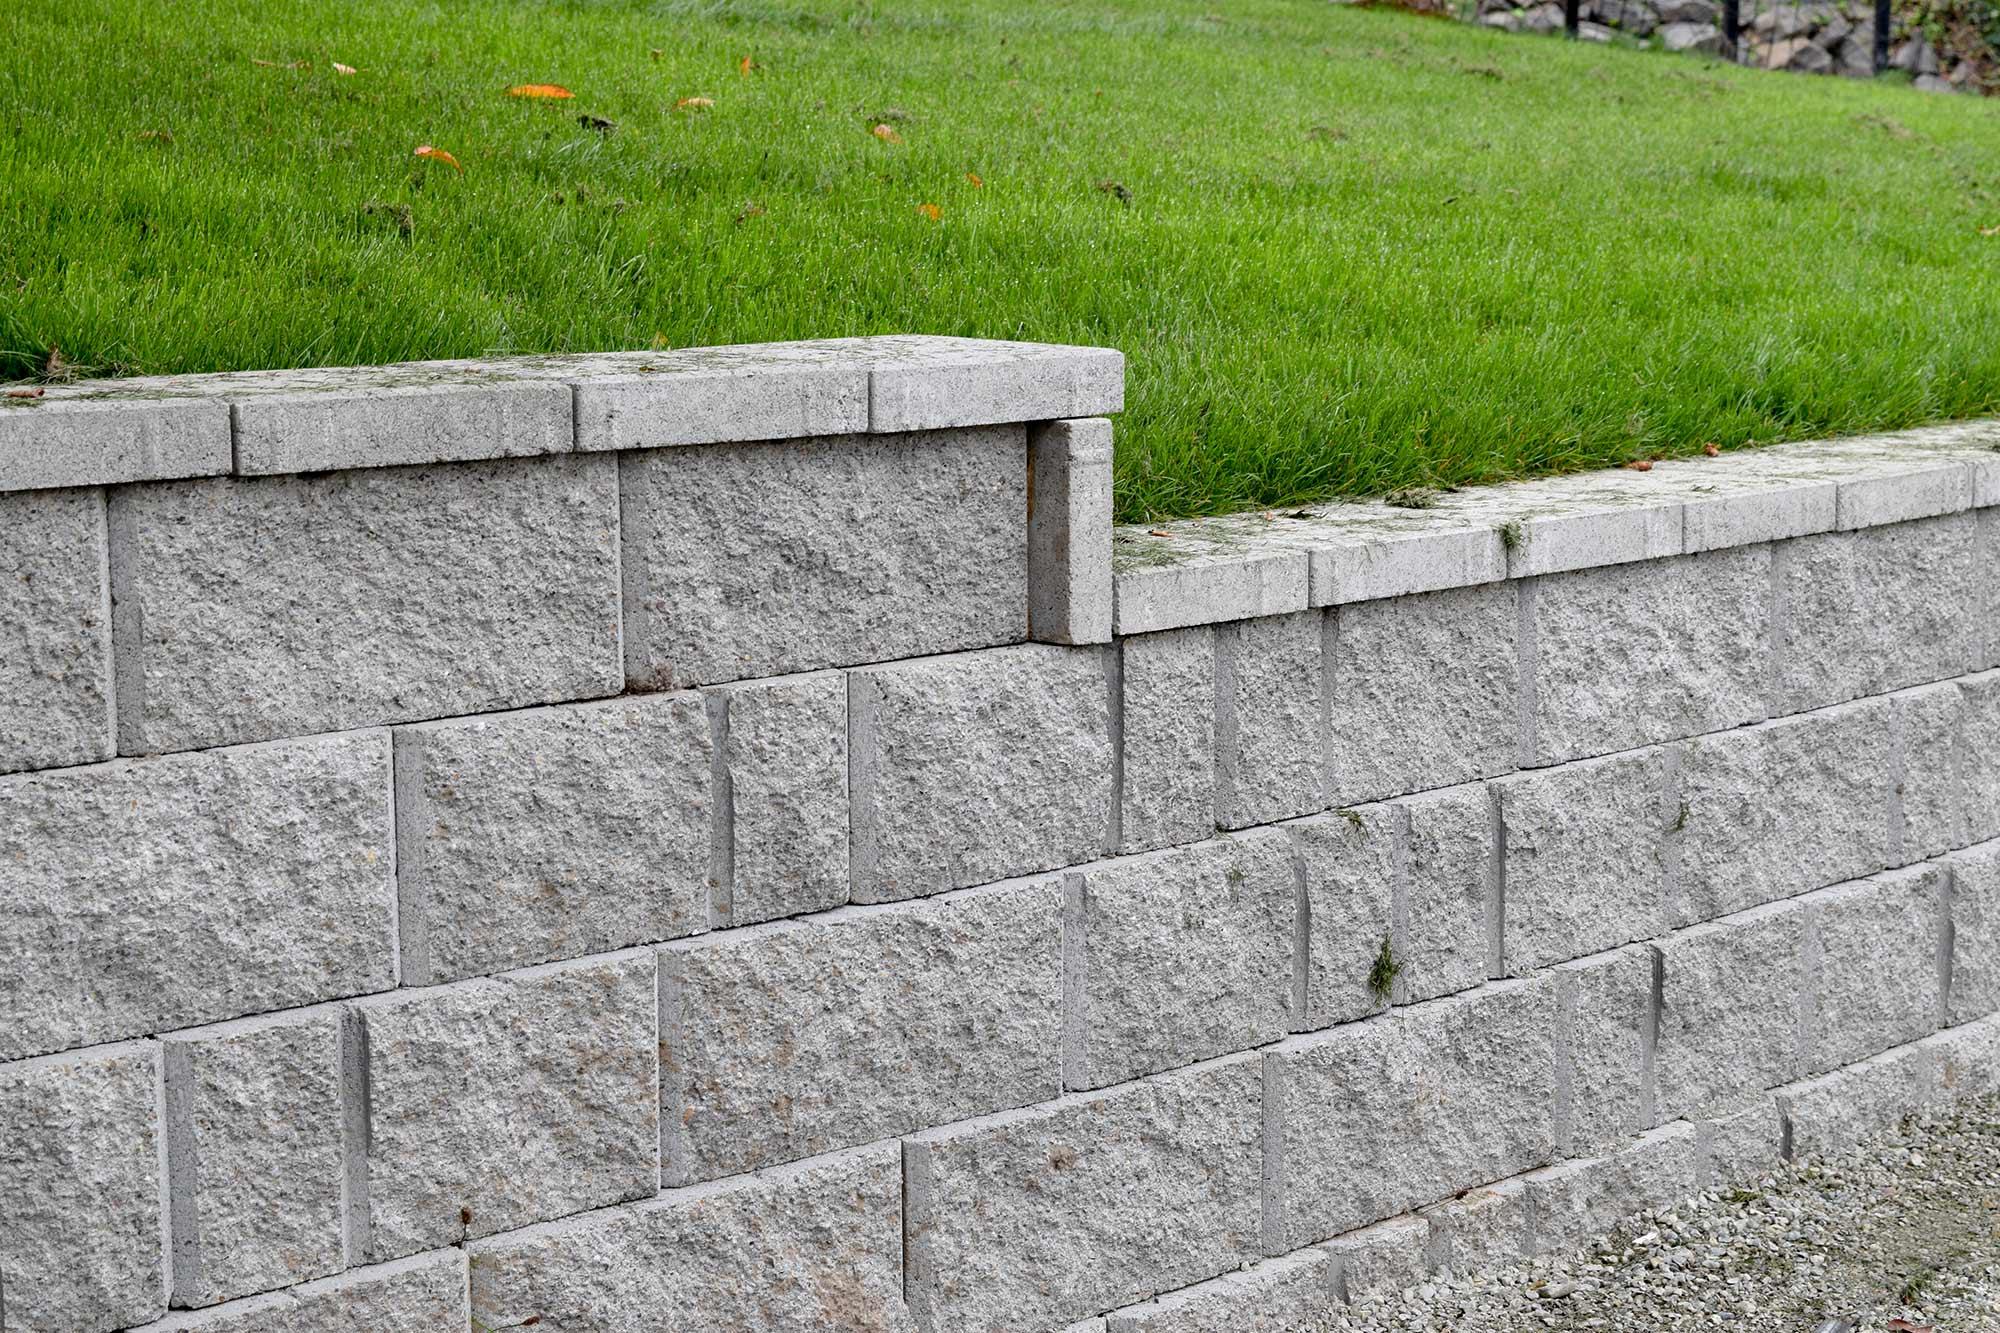 landscaping overhaul in steilacoom ajb landscaping u0026 fence